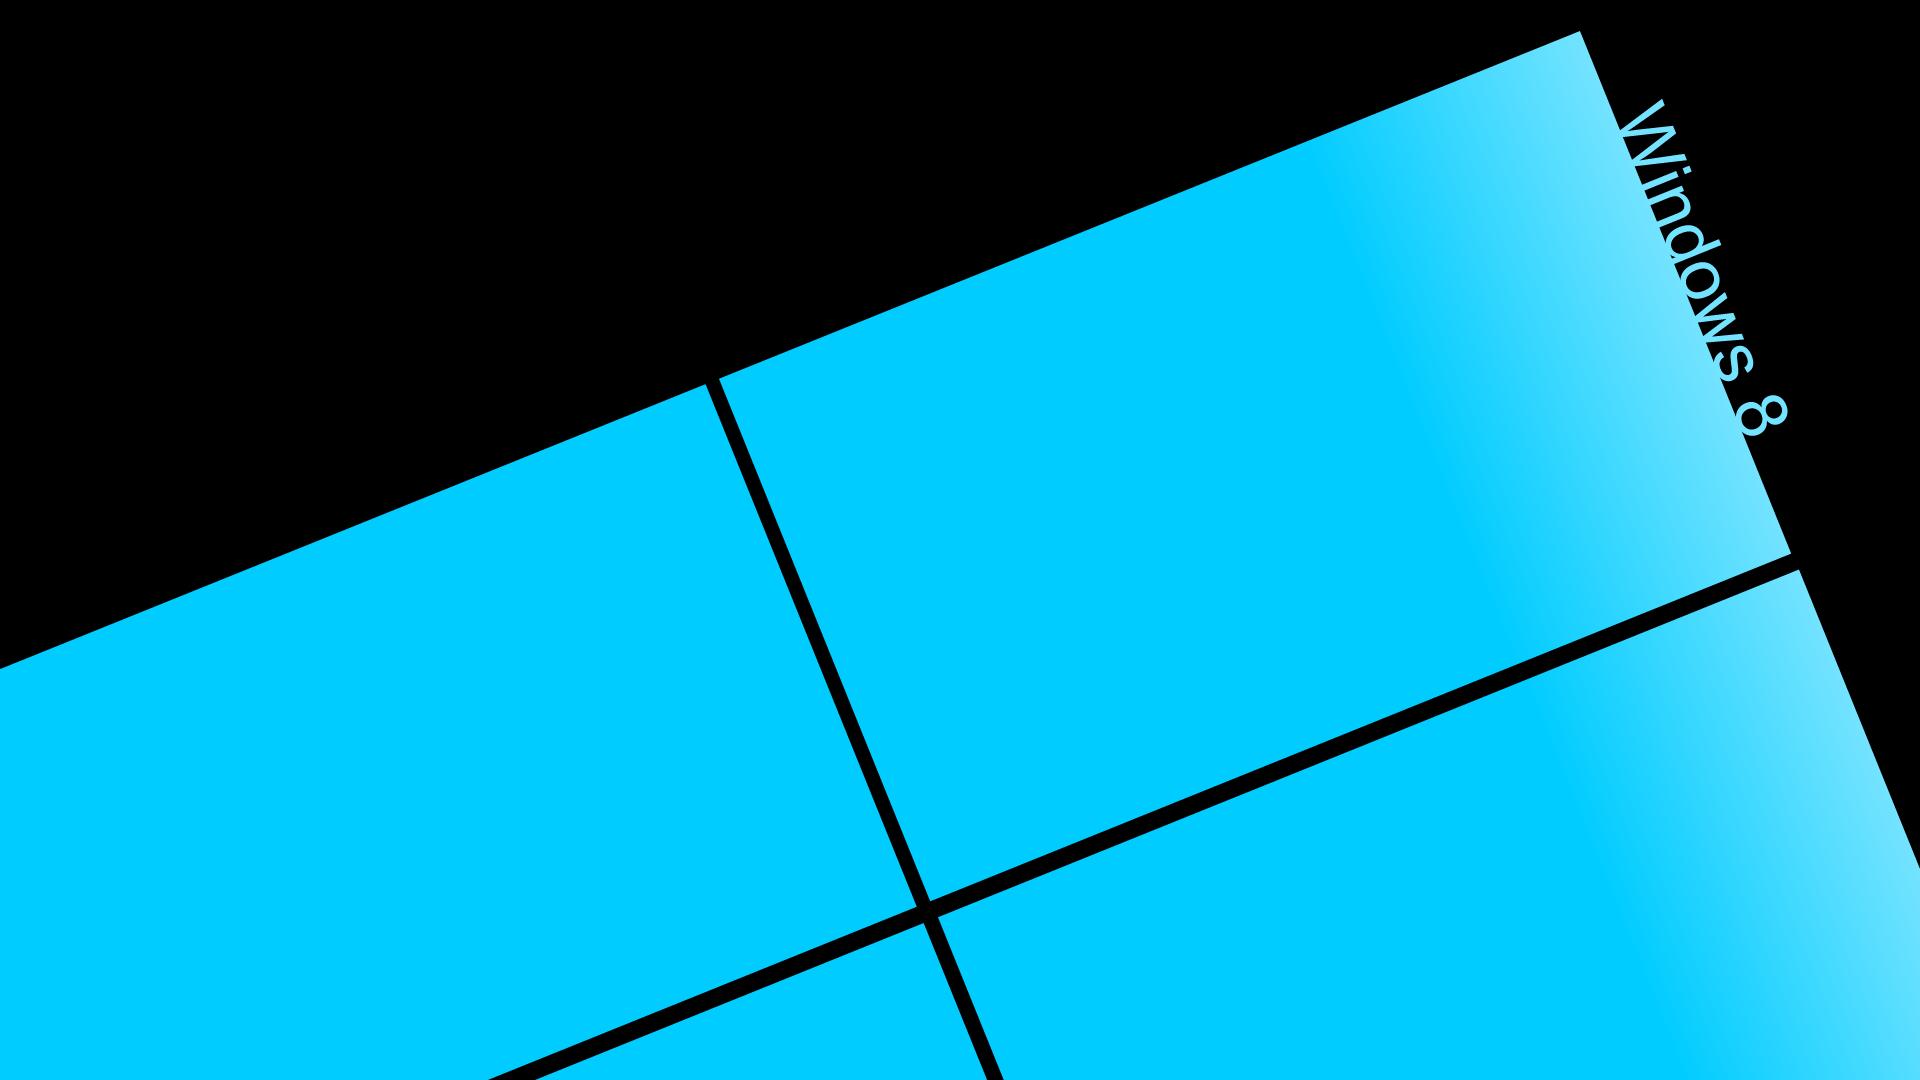 Wallpaper Windows 8  № 1929060 загрузить